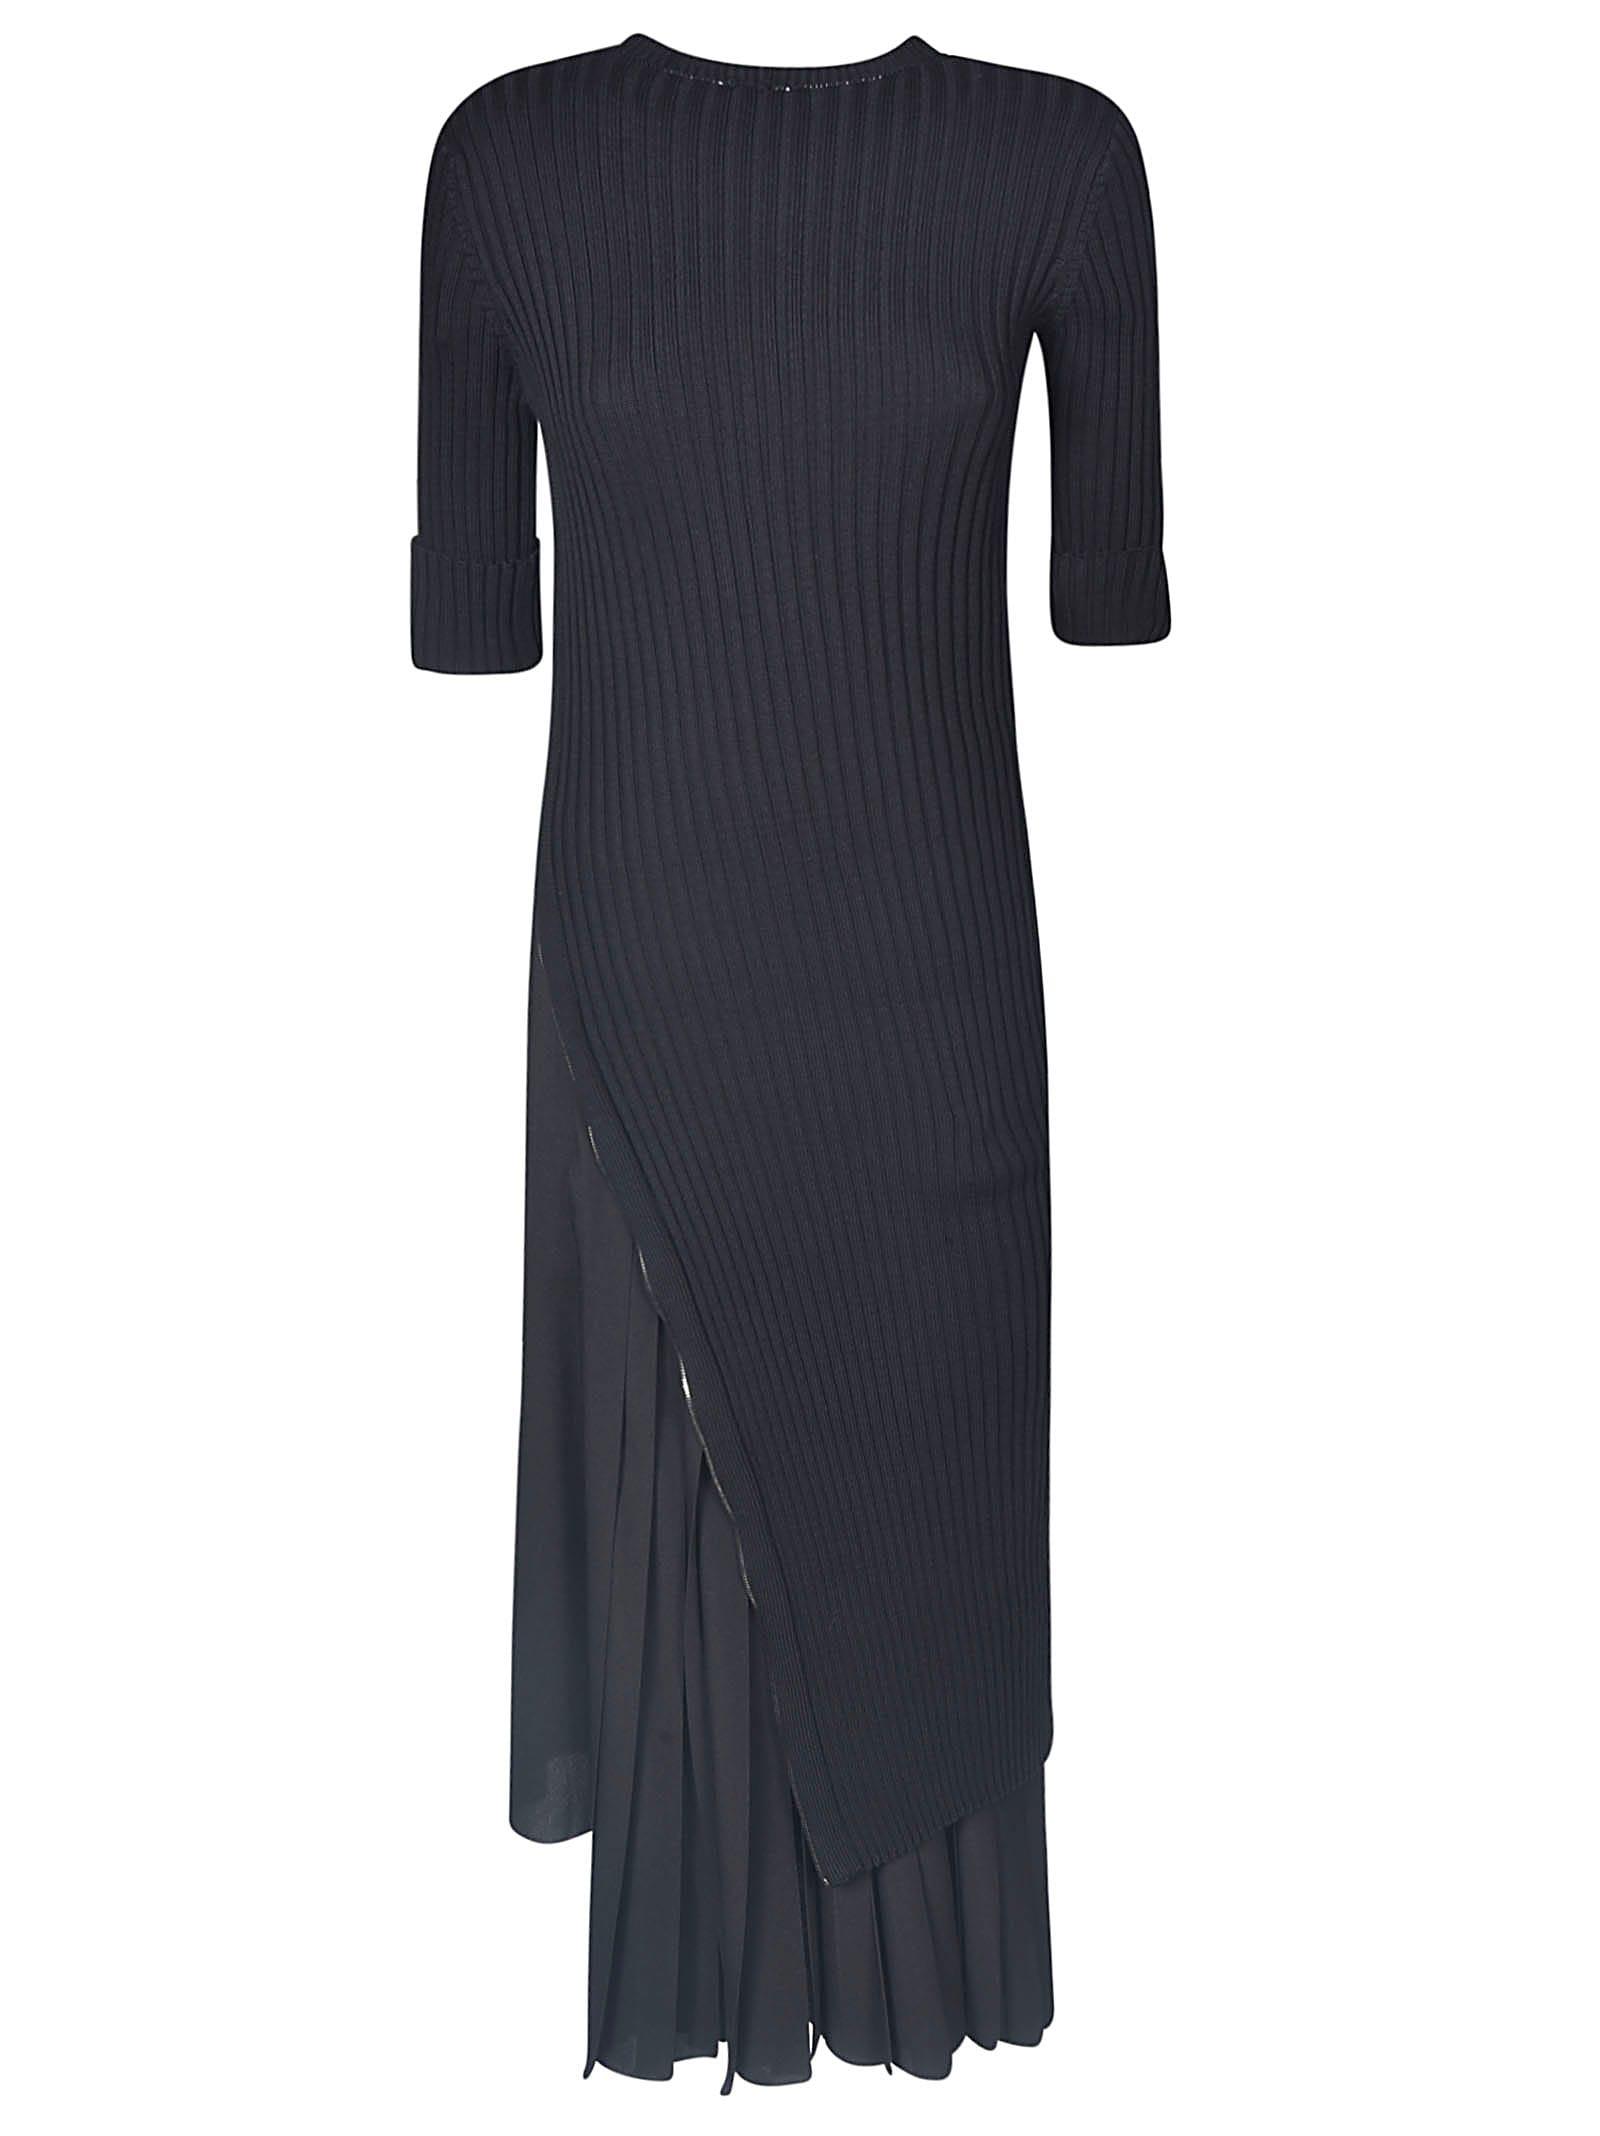 Buy N.21 Ribbed Ruffled Hem Dress online, shop N.21 with free shipping